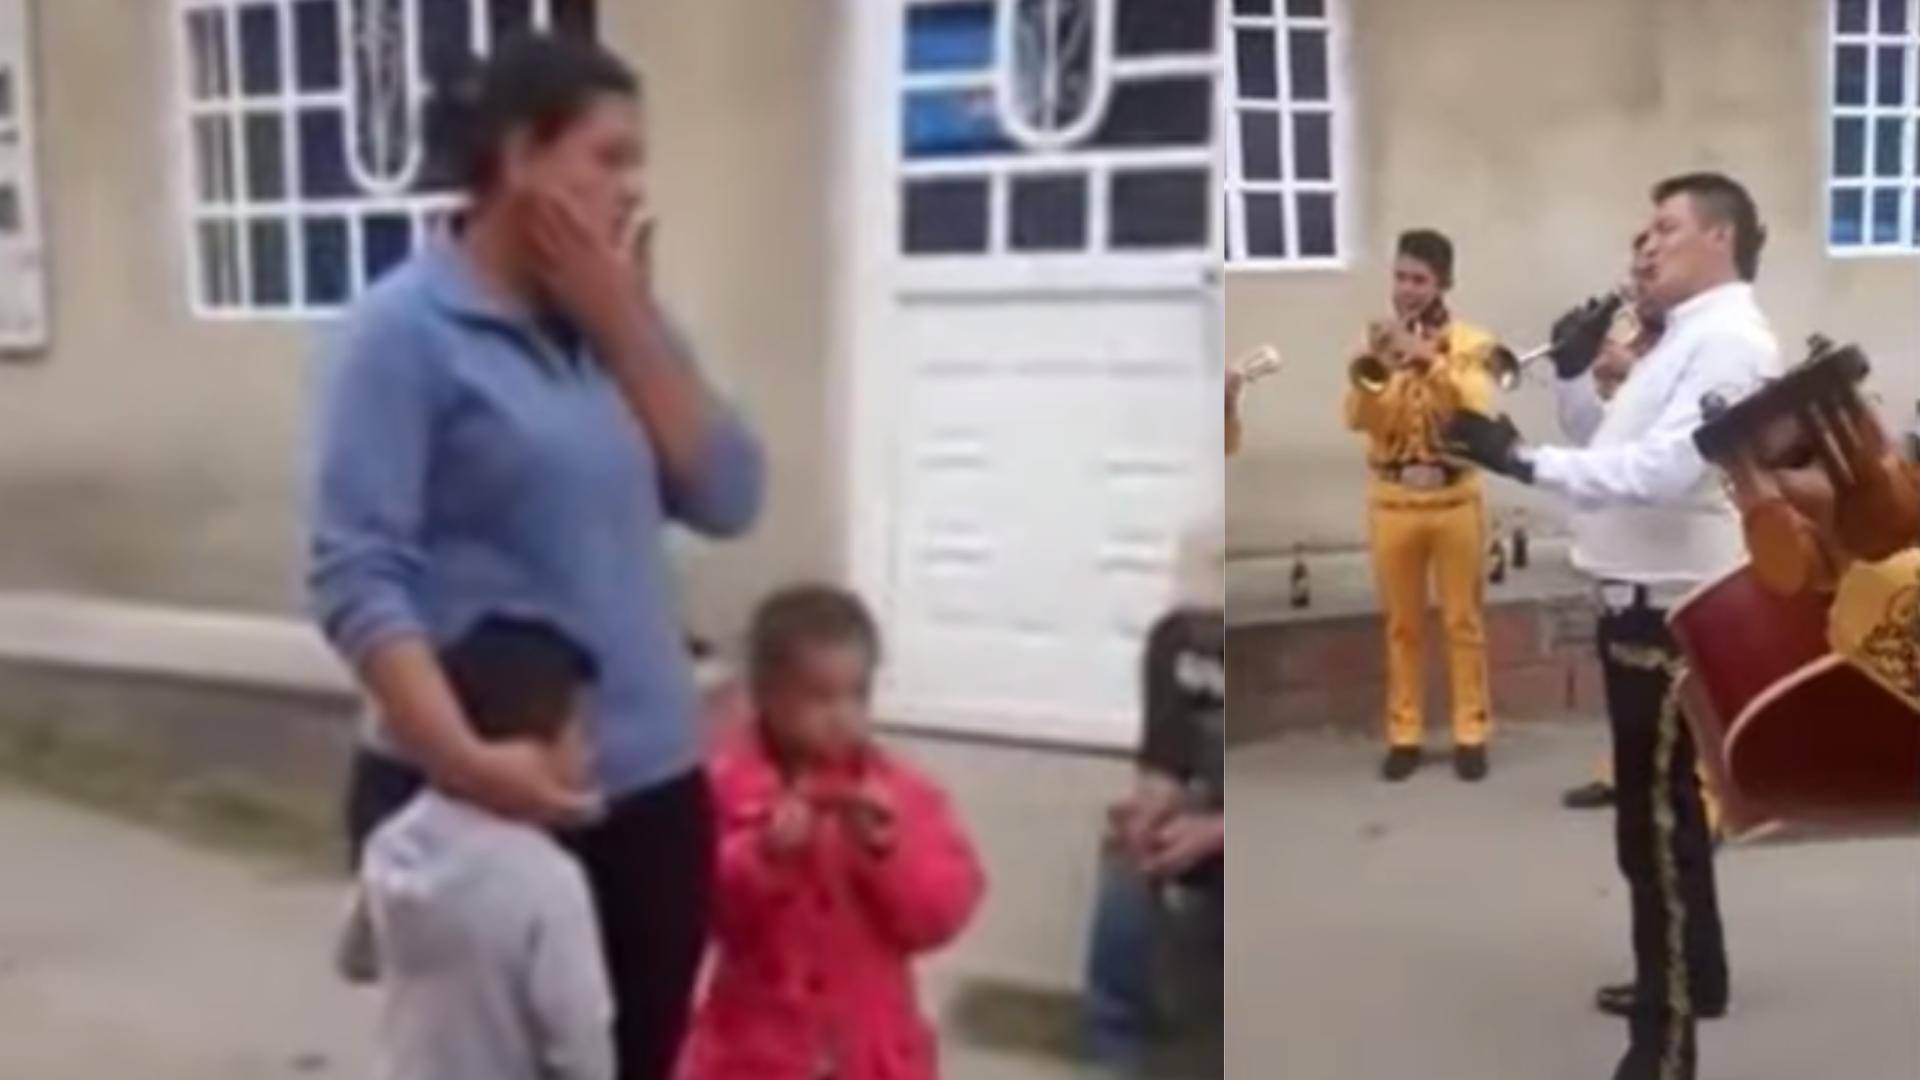 Niño paga con canicas a Marichis para llevarle serenata a su mamá